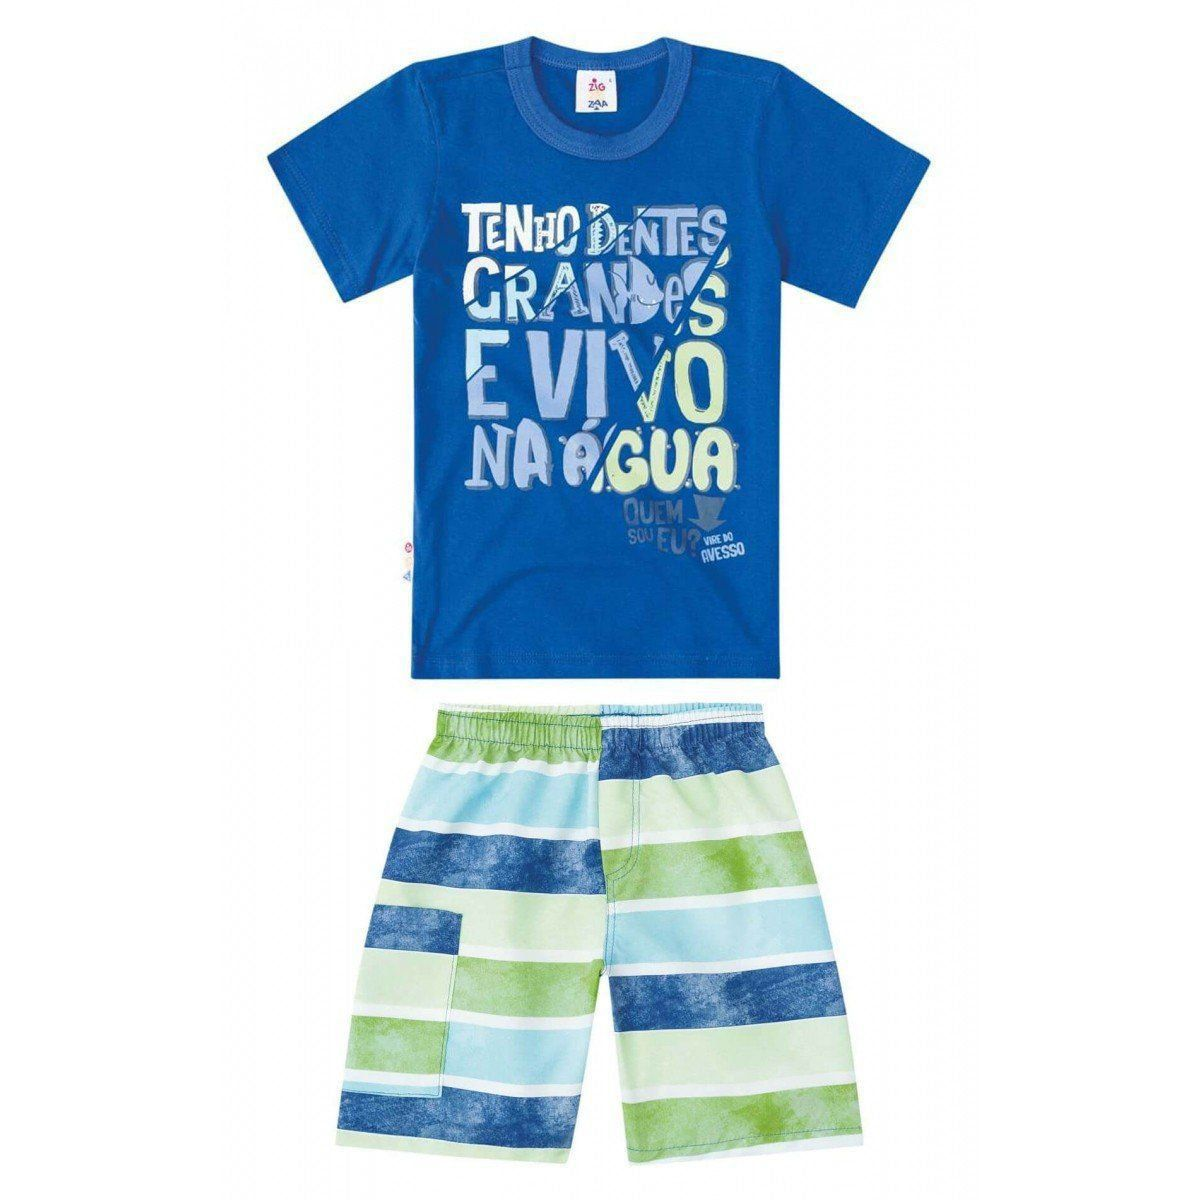 Conjunto Infantil Masculino Azul Royal Quem sou eu? Zig Zig Zaa